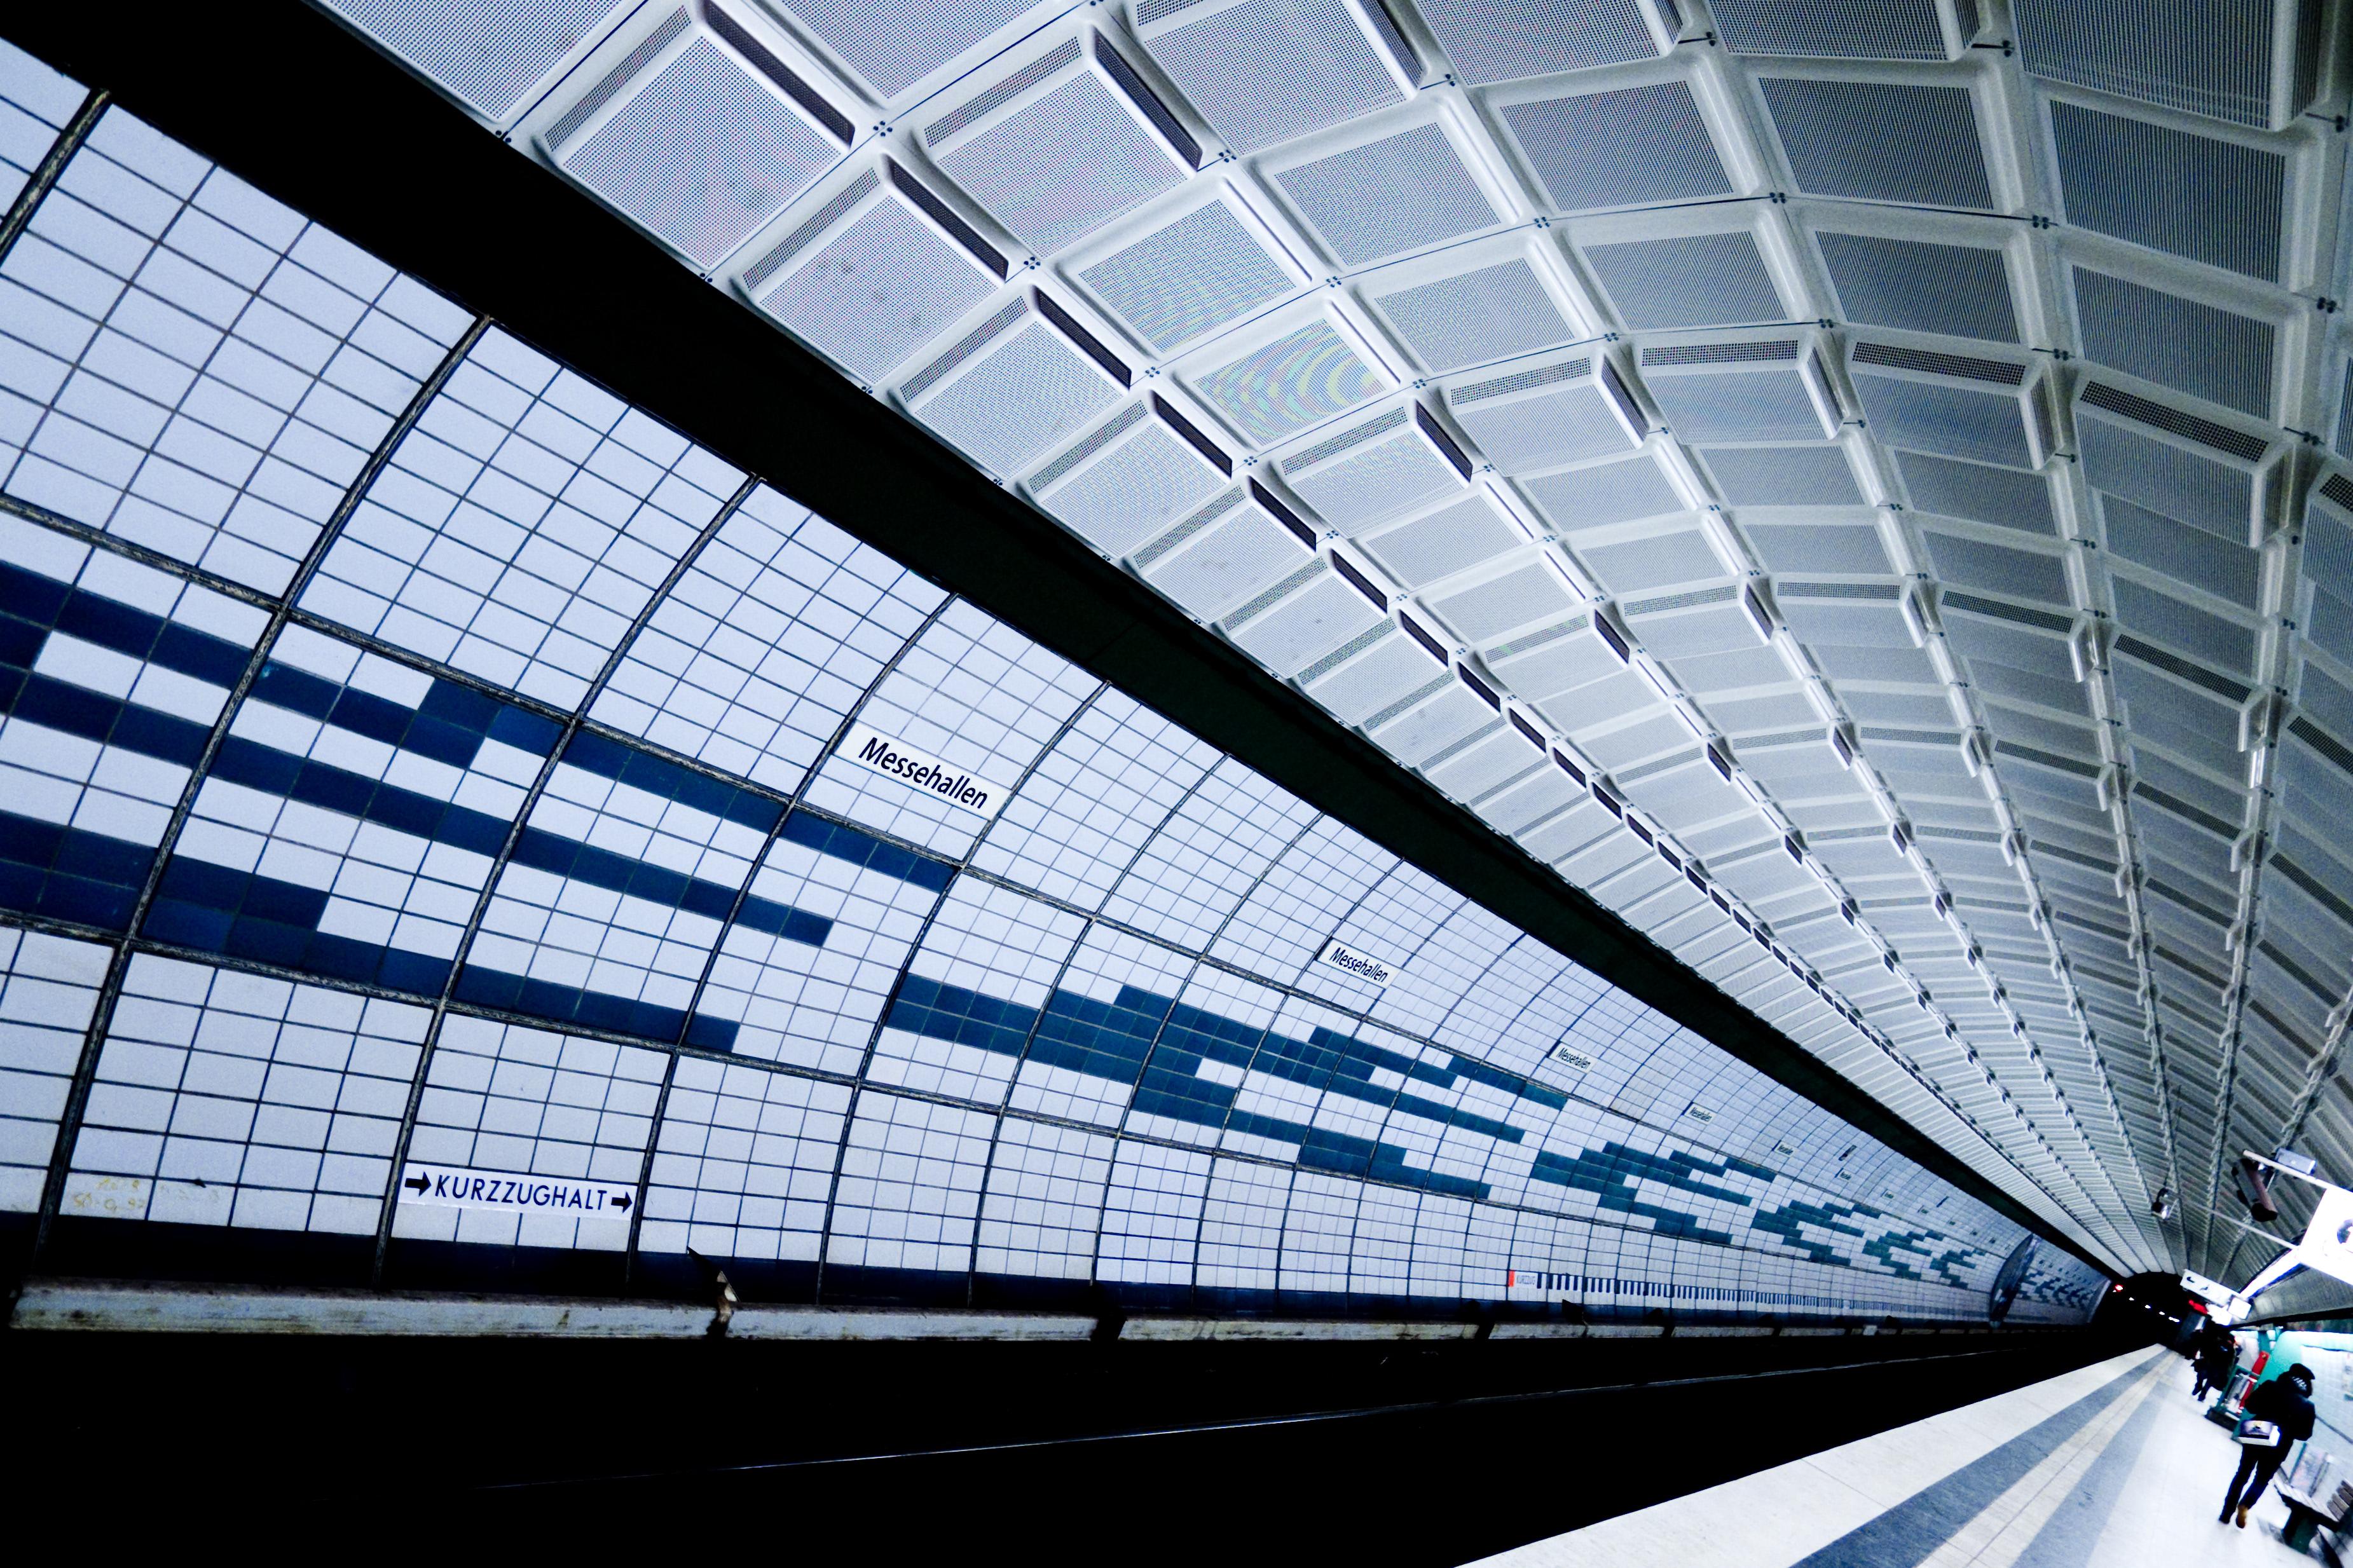 Fond D Ecran Lignes U2 Geometrie Courbes Hambourg